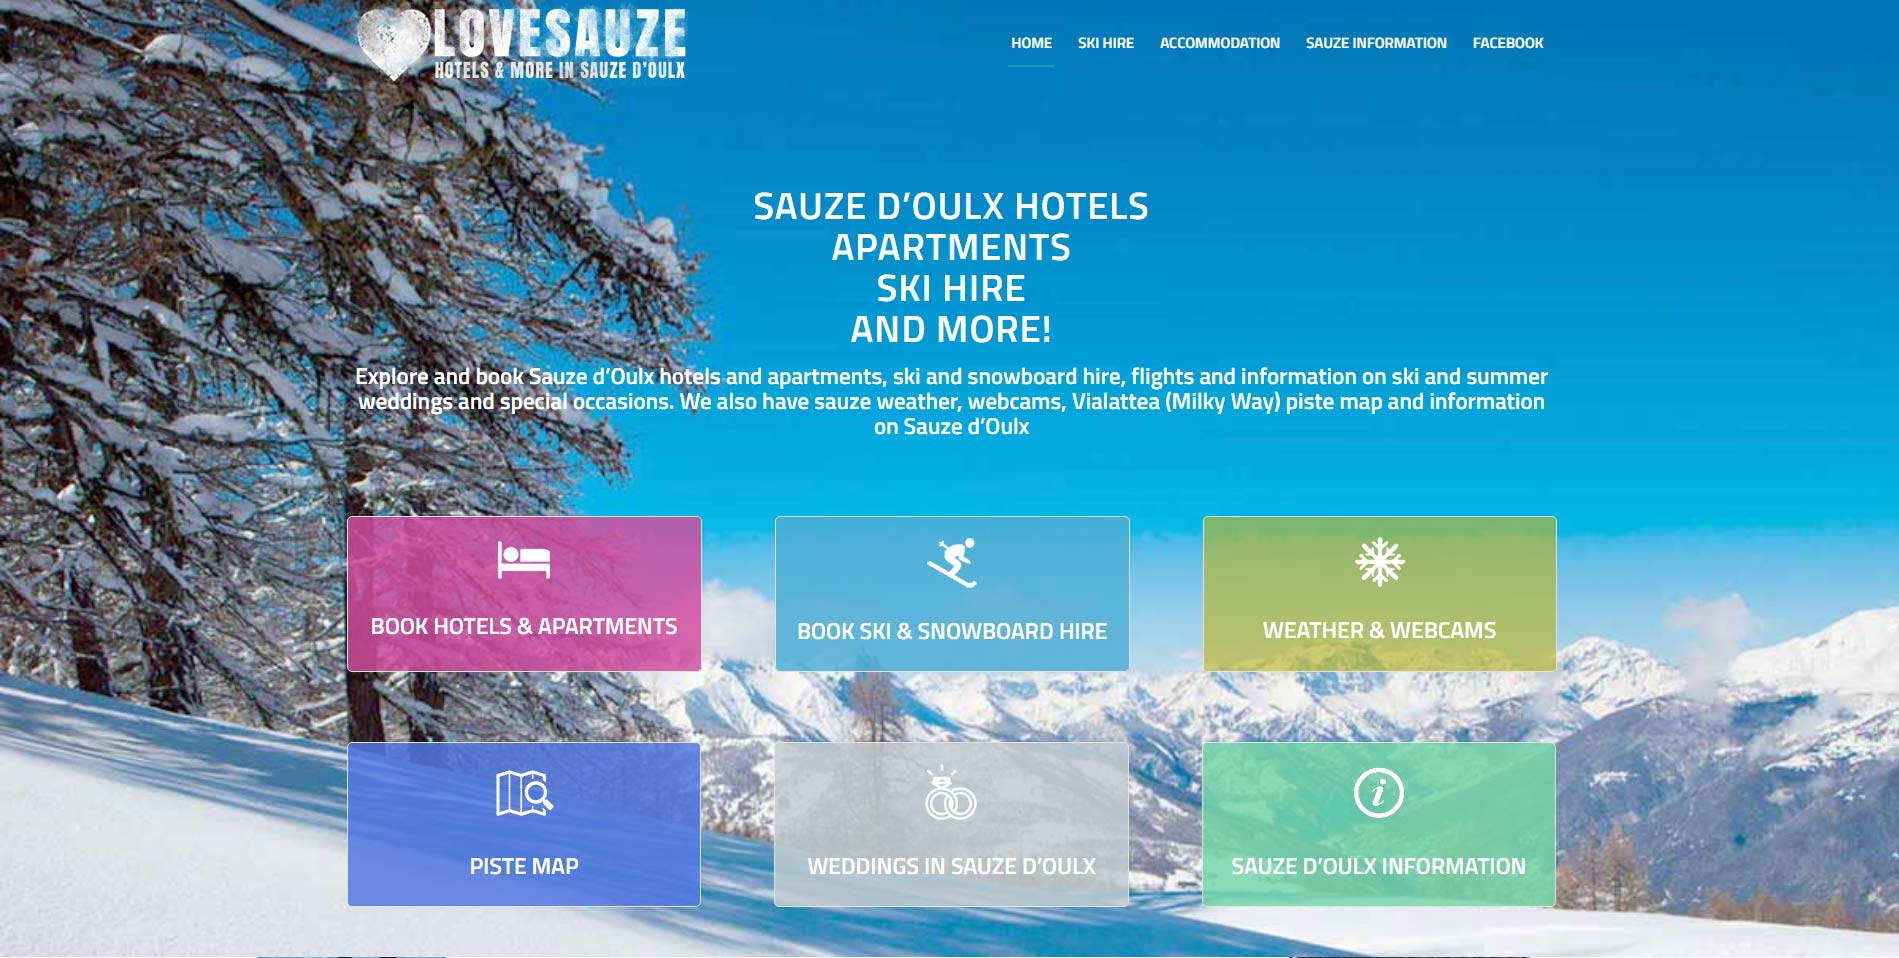 Love Sauze, Sauze d'Oulx, website  design by Alps Creative